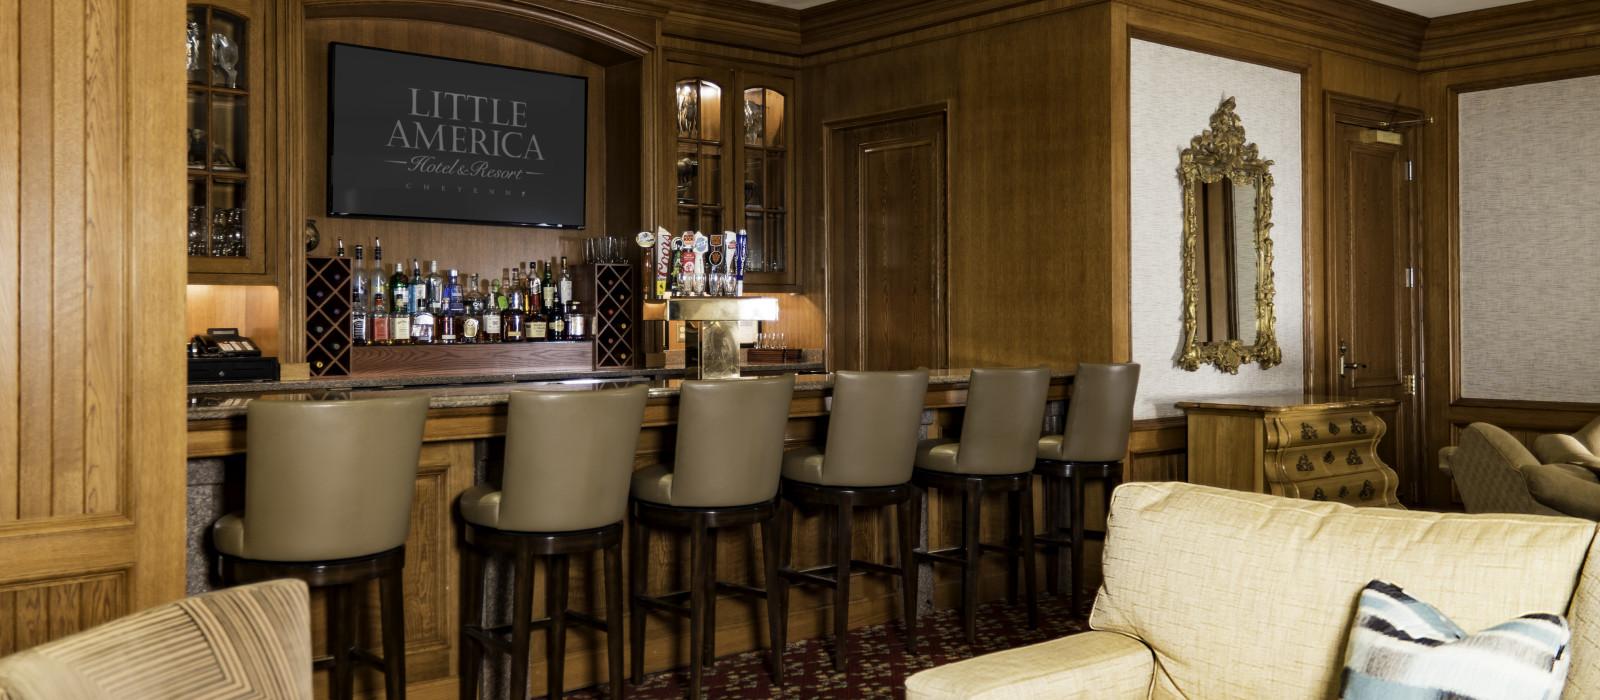 Hotel Little America  Cheyenne USA